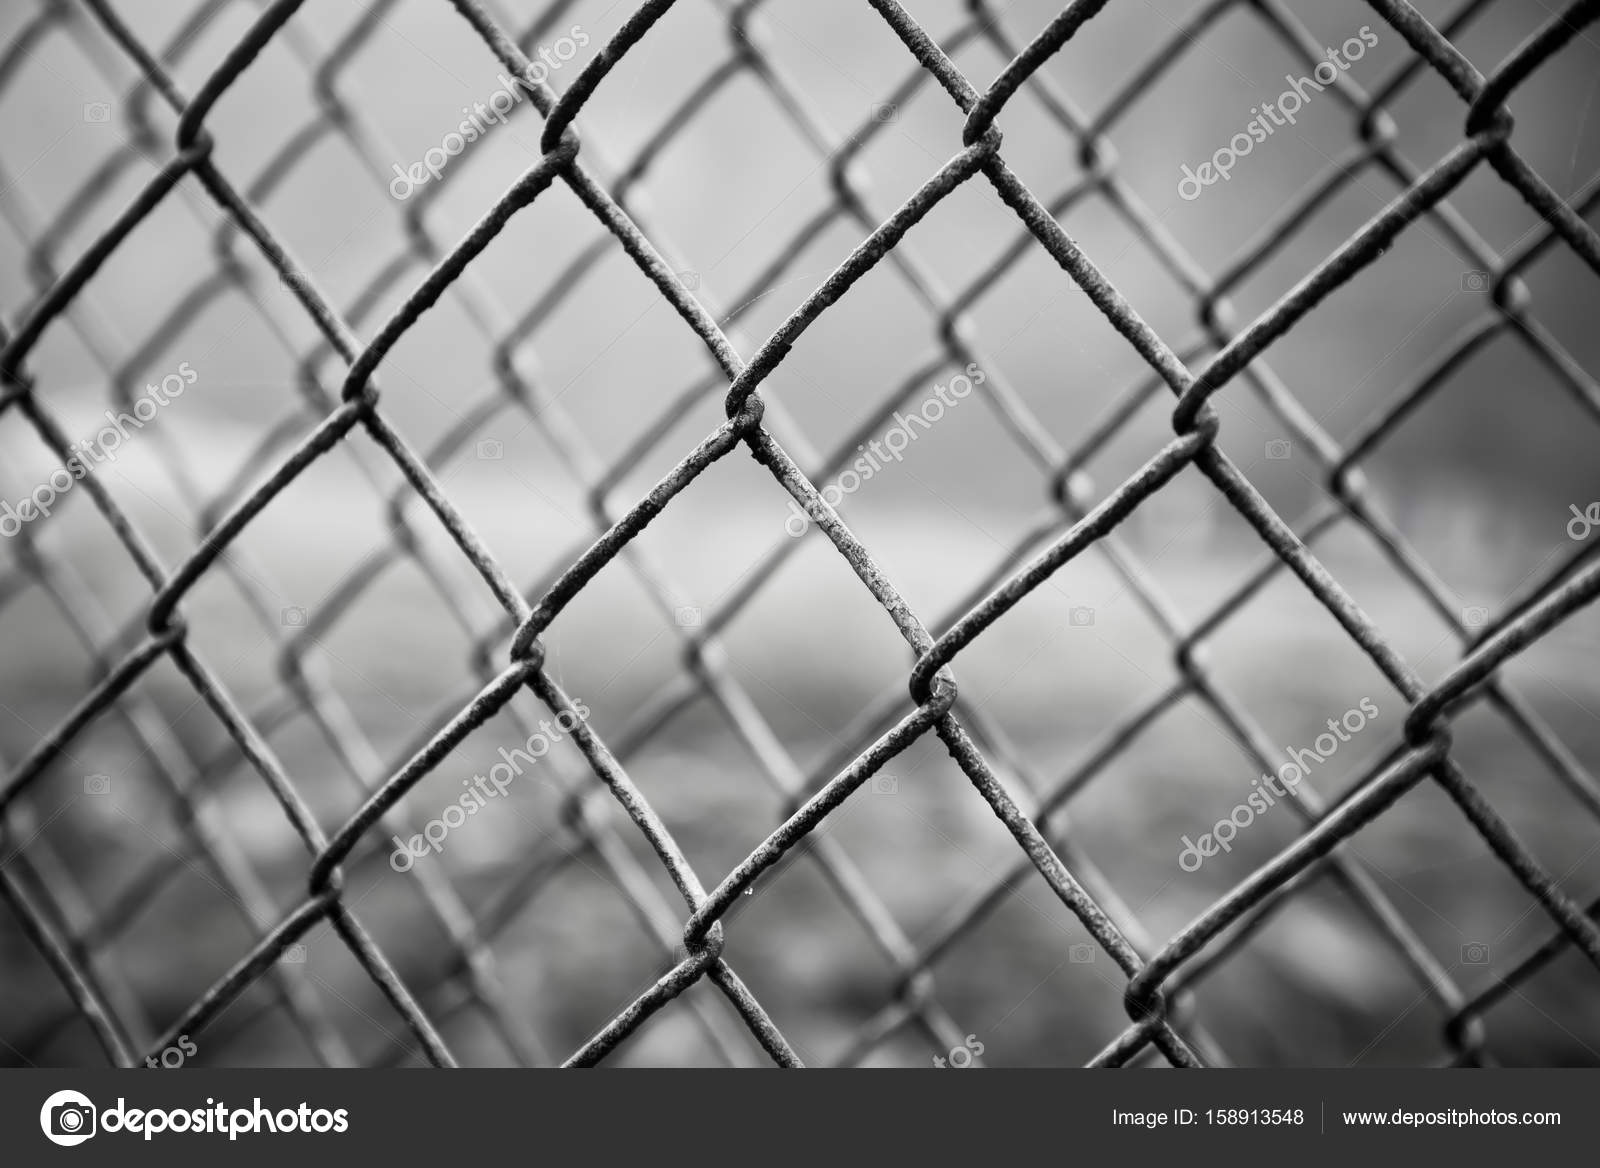 Rostigen Stahl Maschendrahtzaun Stockfoto C Tomgigabite 158913548